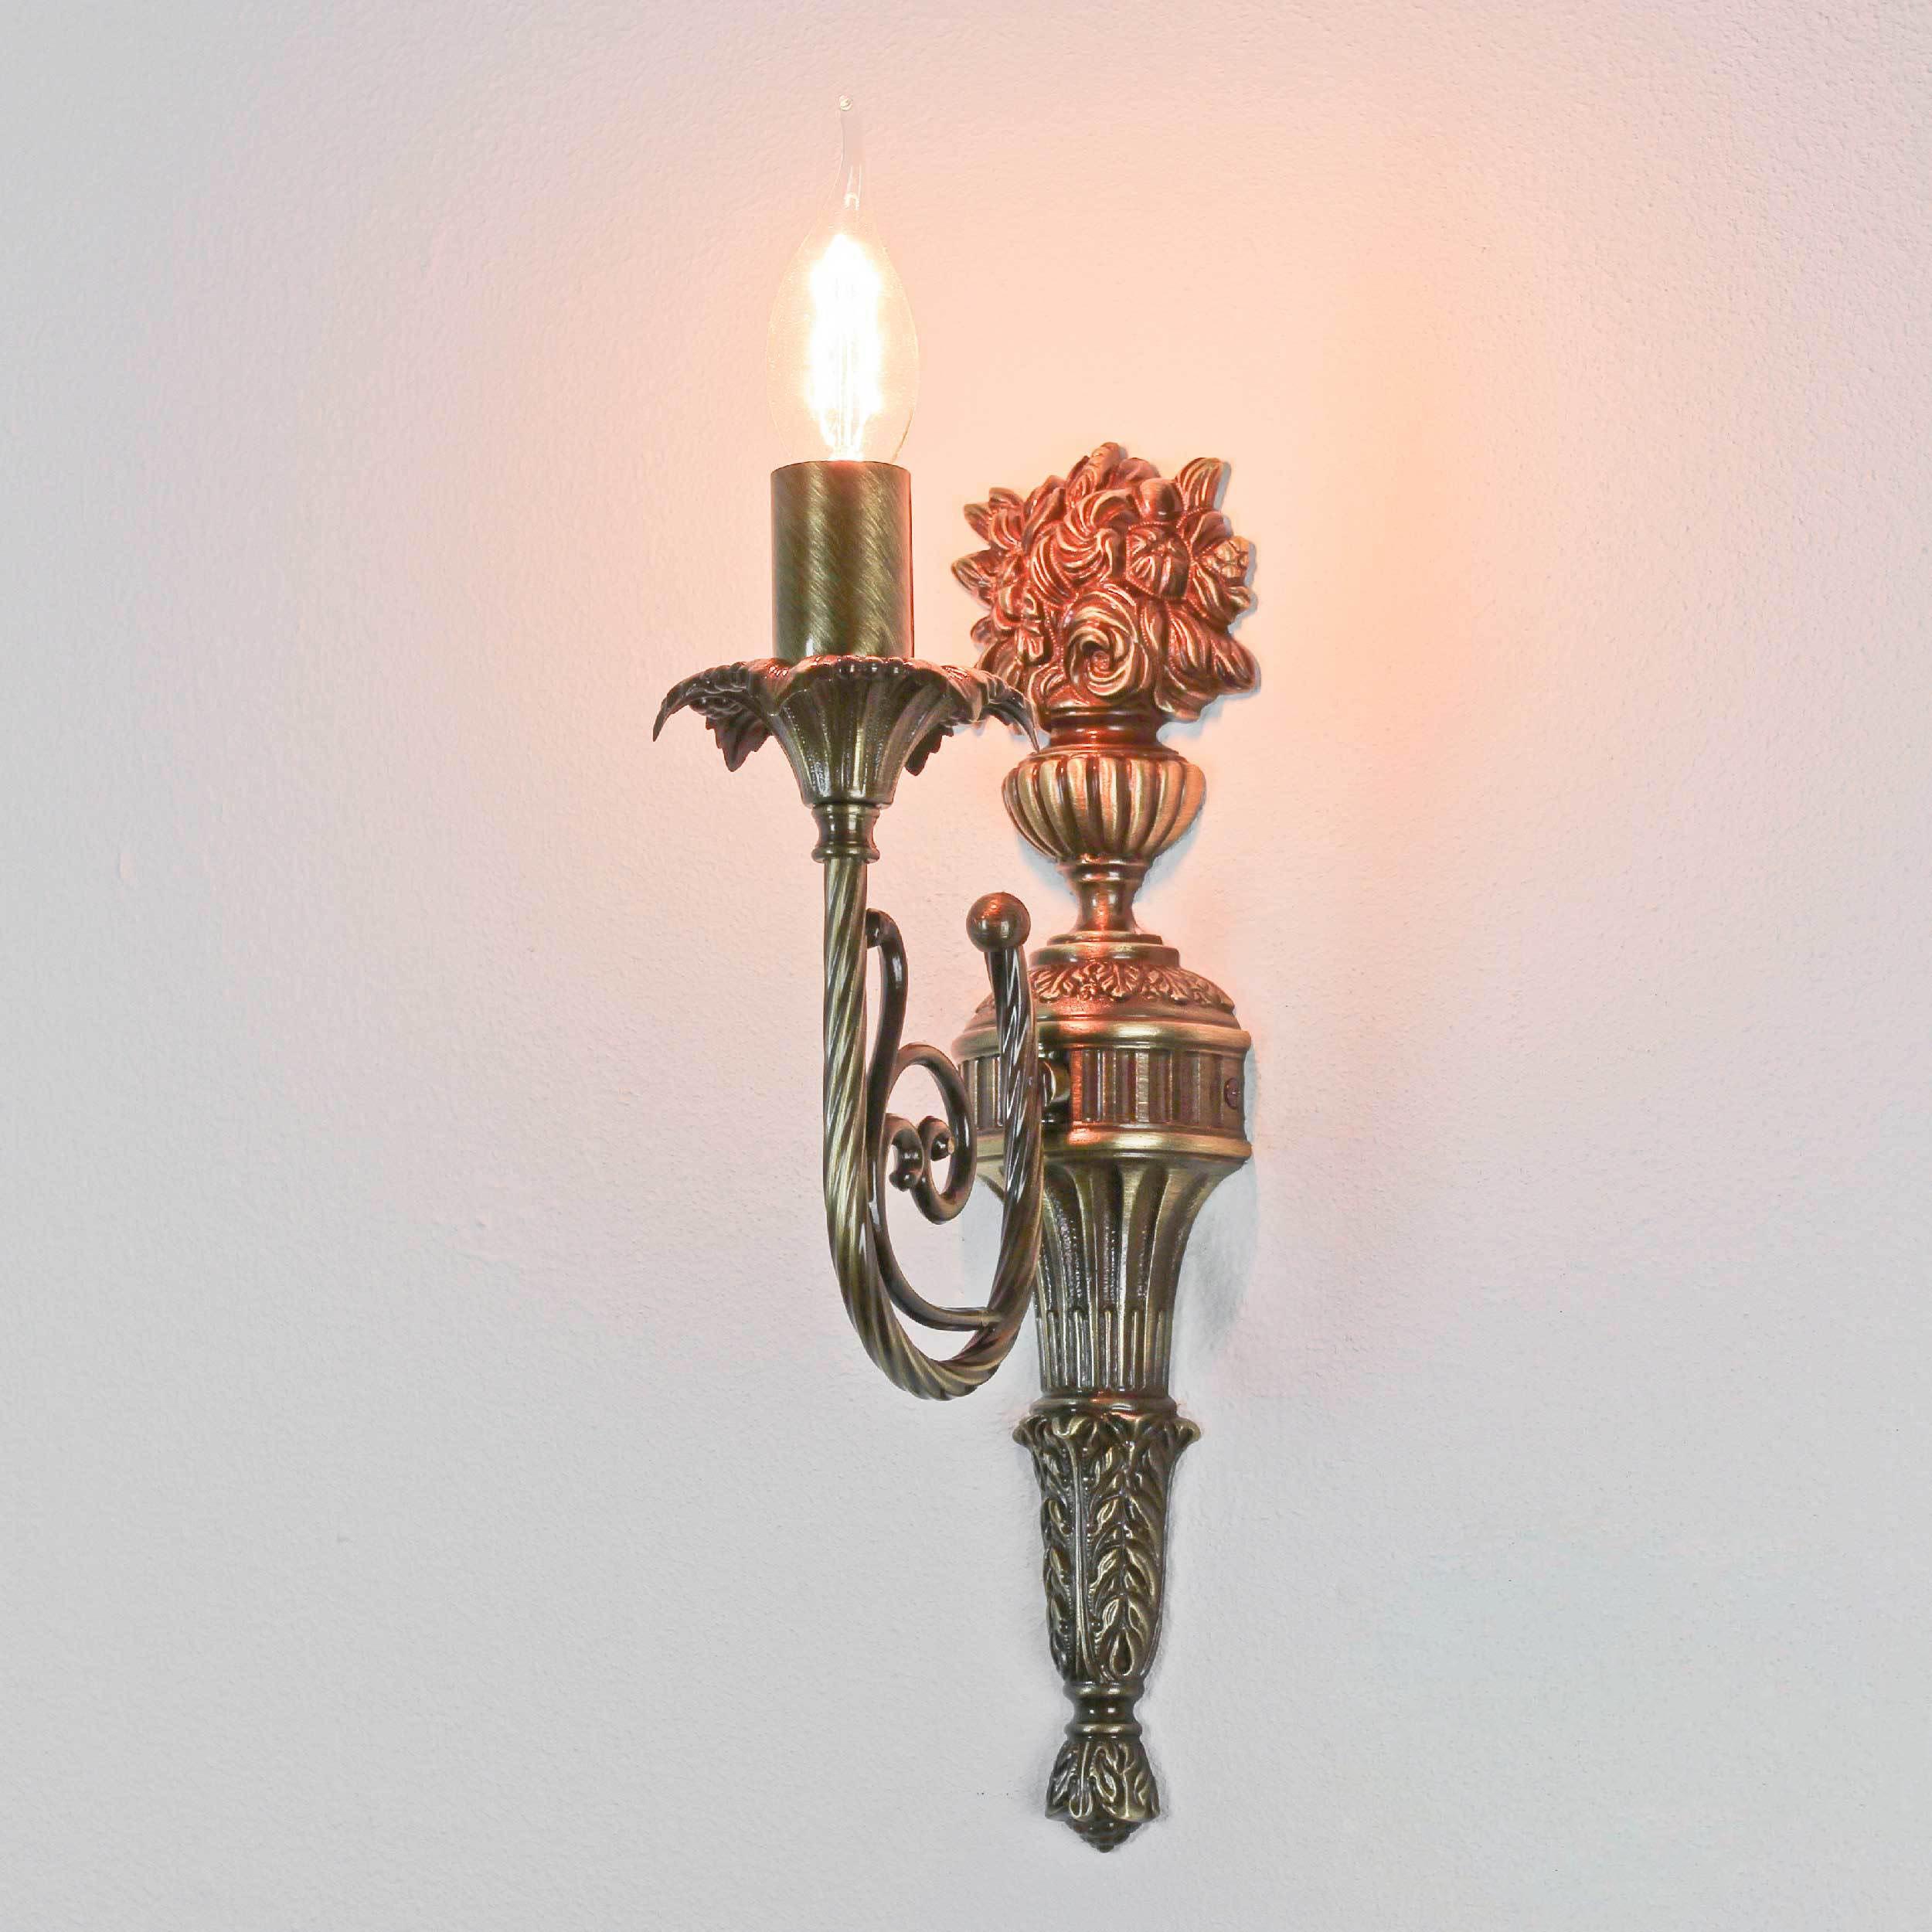 Wandlampe Weiß Stoffschirm aus Echt-Messing Luigi